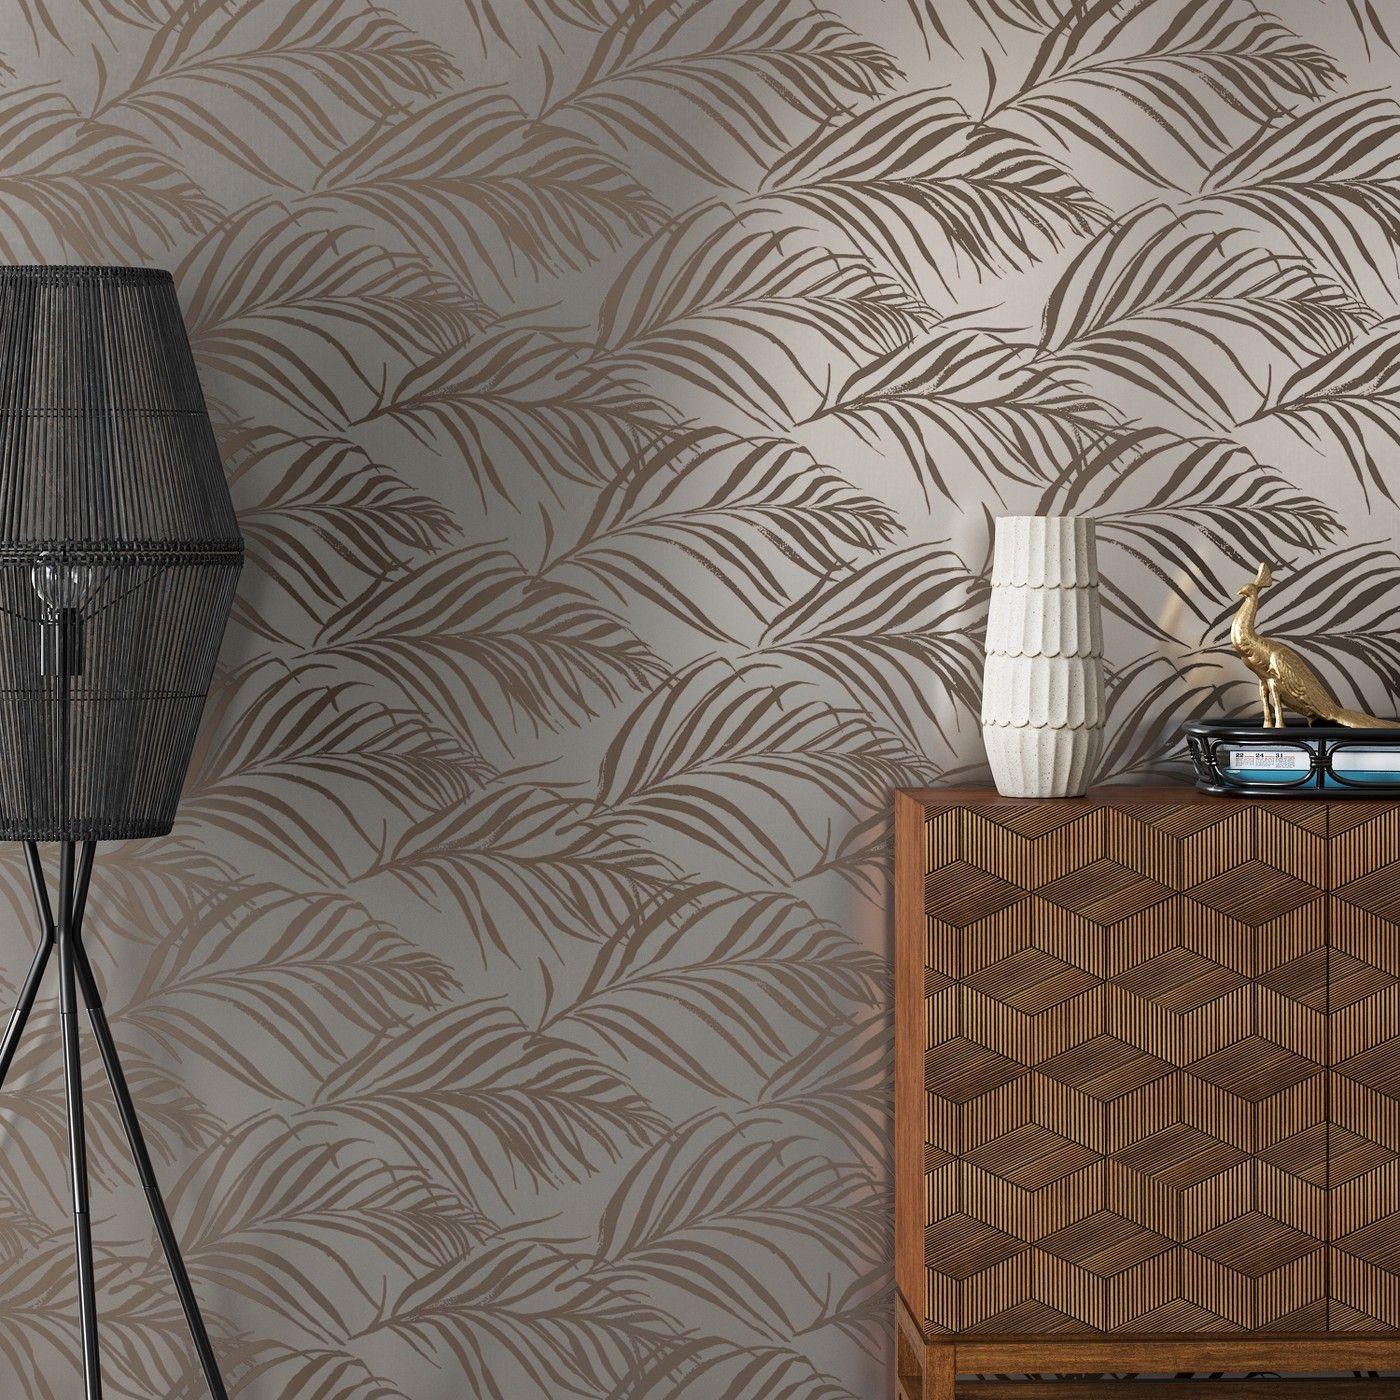 Metallic Palma Peel Stick Wallpaper Silver Opalhouse Peel And Stick Wallpaper Palm Print Wallpaper Traditional Wallpaper